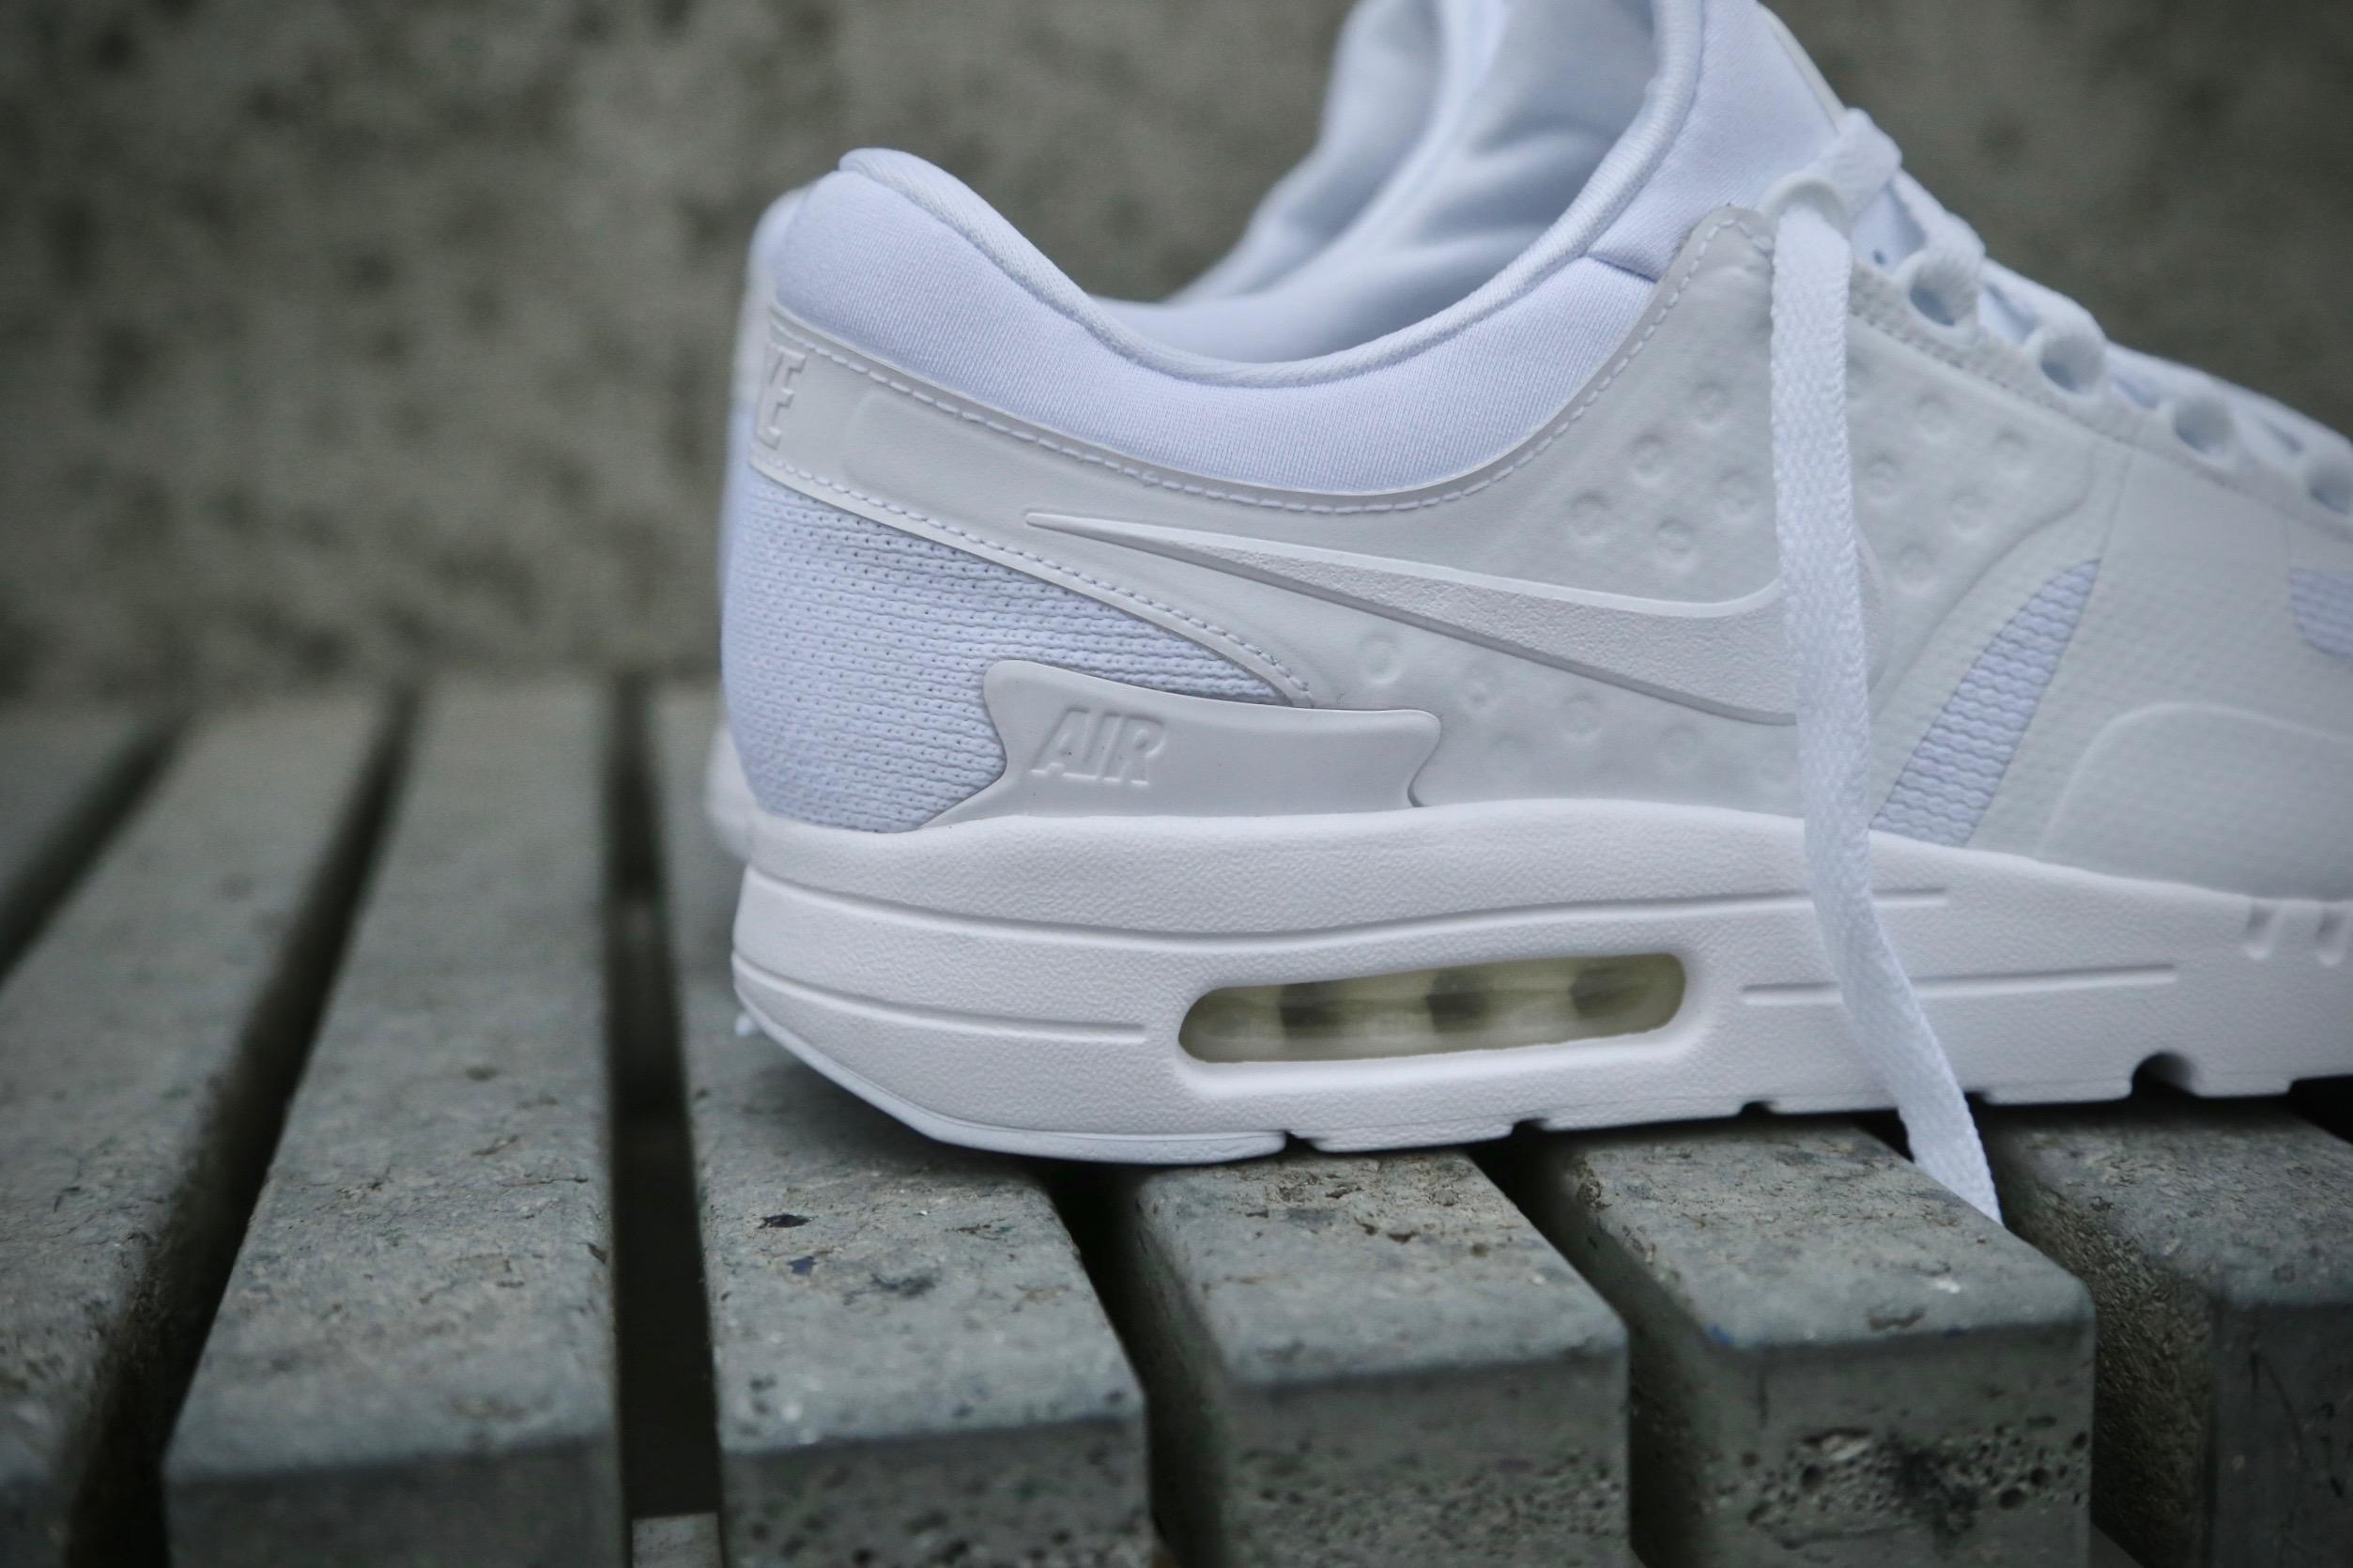 186cac6ad2 Nike Air Max Zero Essential – White / White / Wolf Grey – STASP